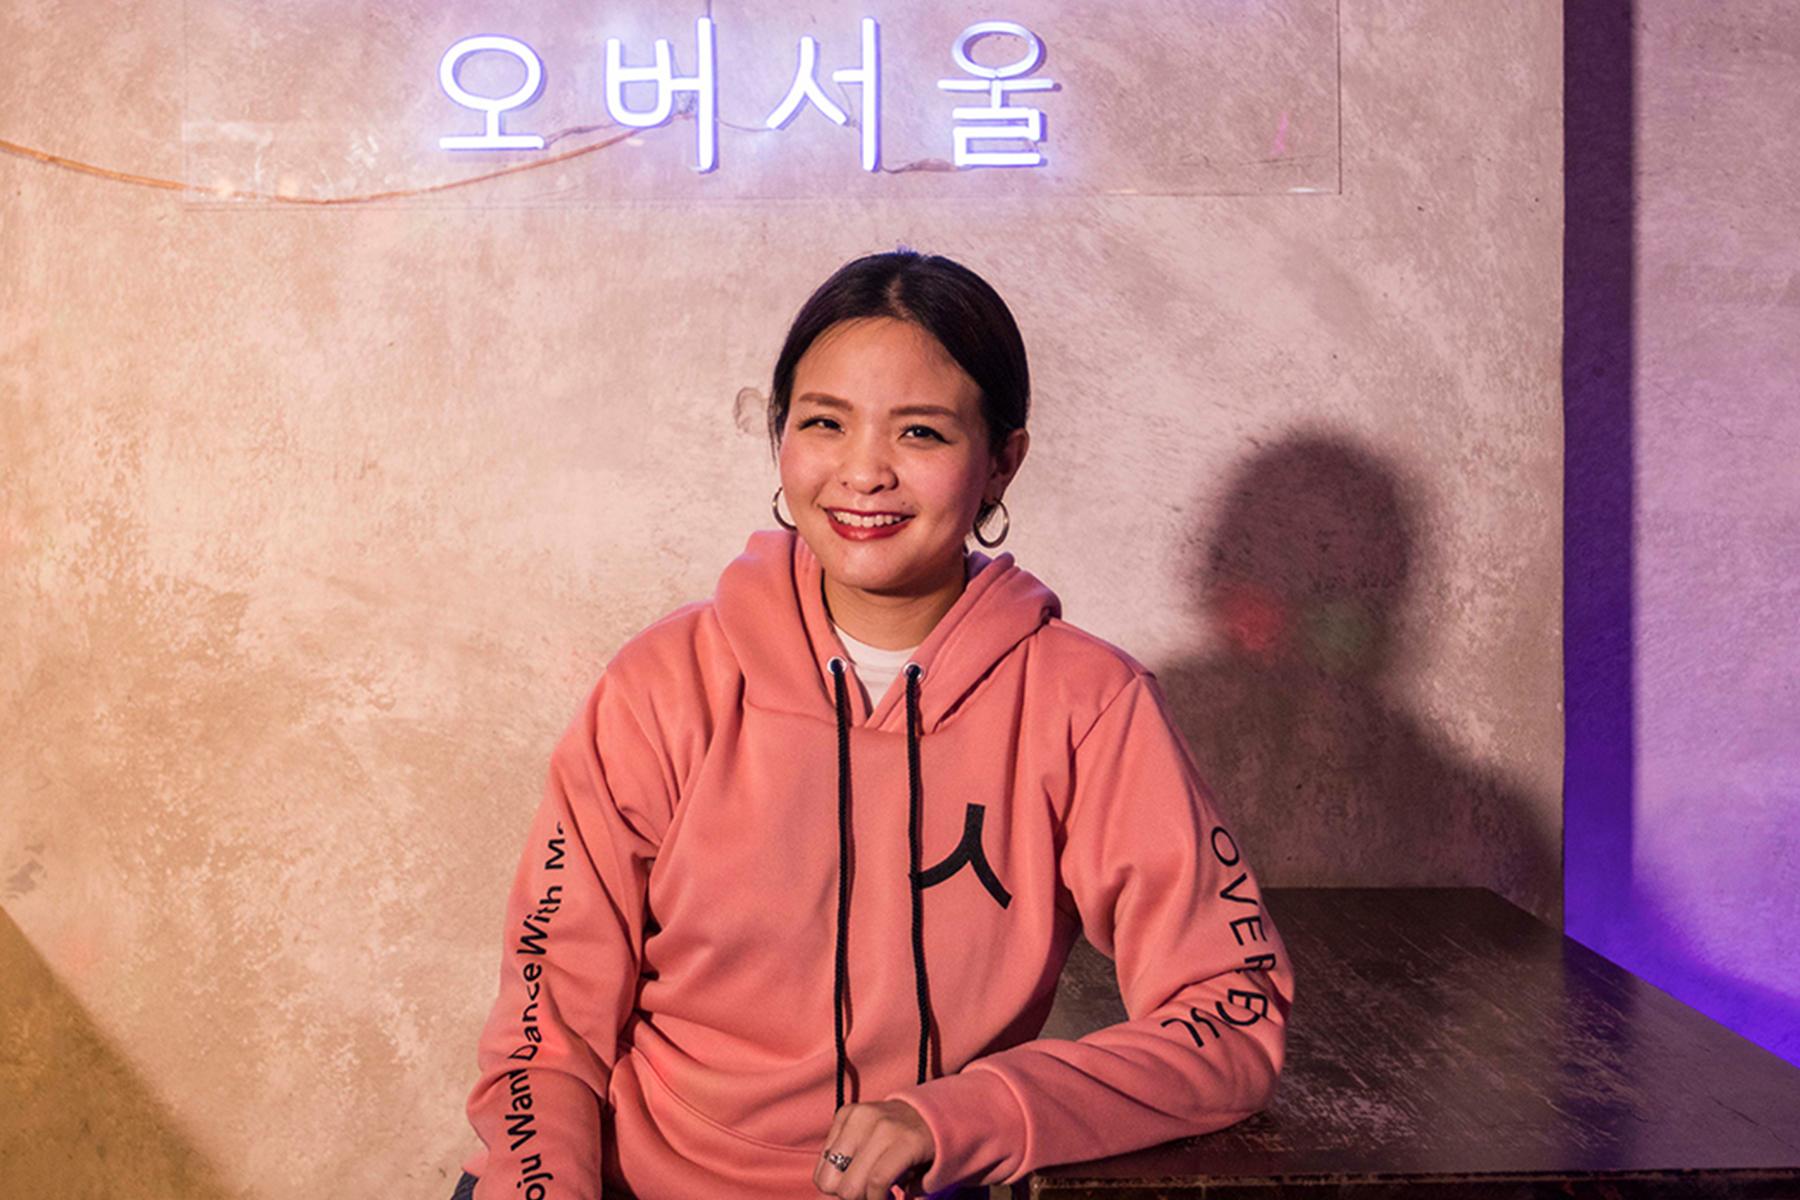 OVERSEOUL – บาร์เกาหลีที่ให้คุณได้เต้นกับเพื่อนโต๊ะข้างๆ   Founder